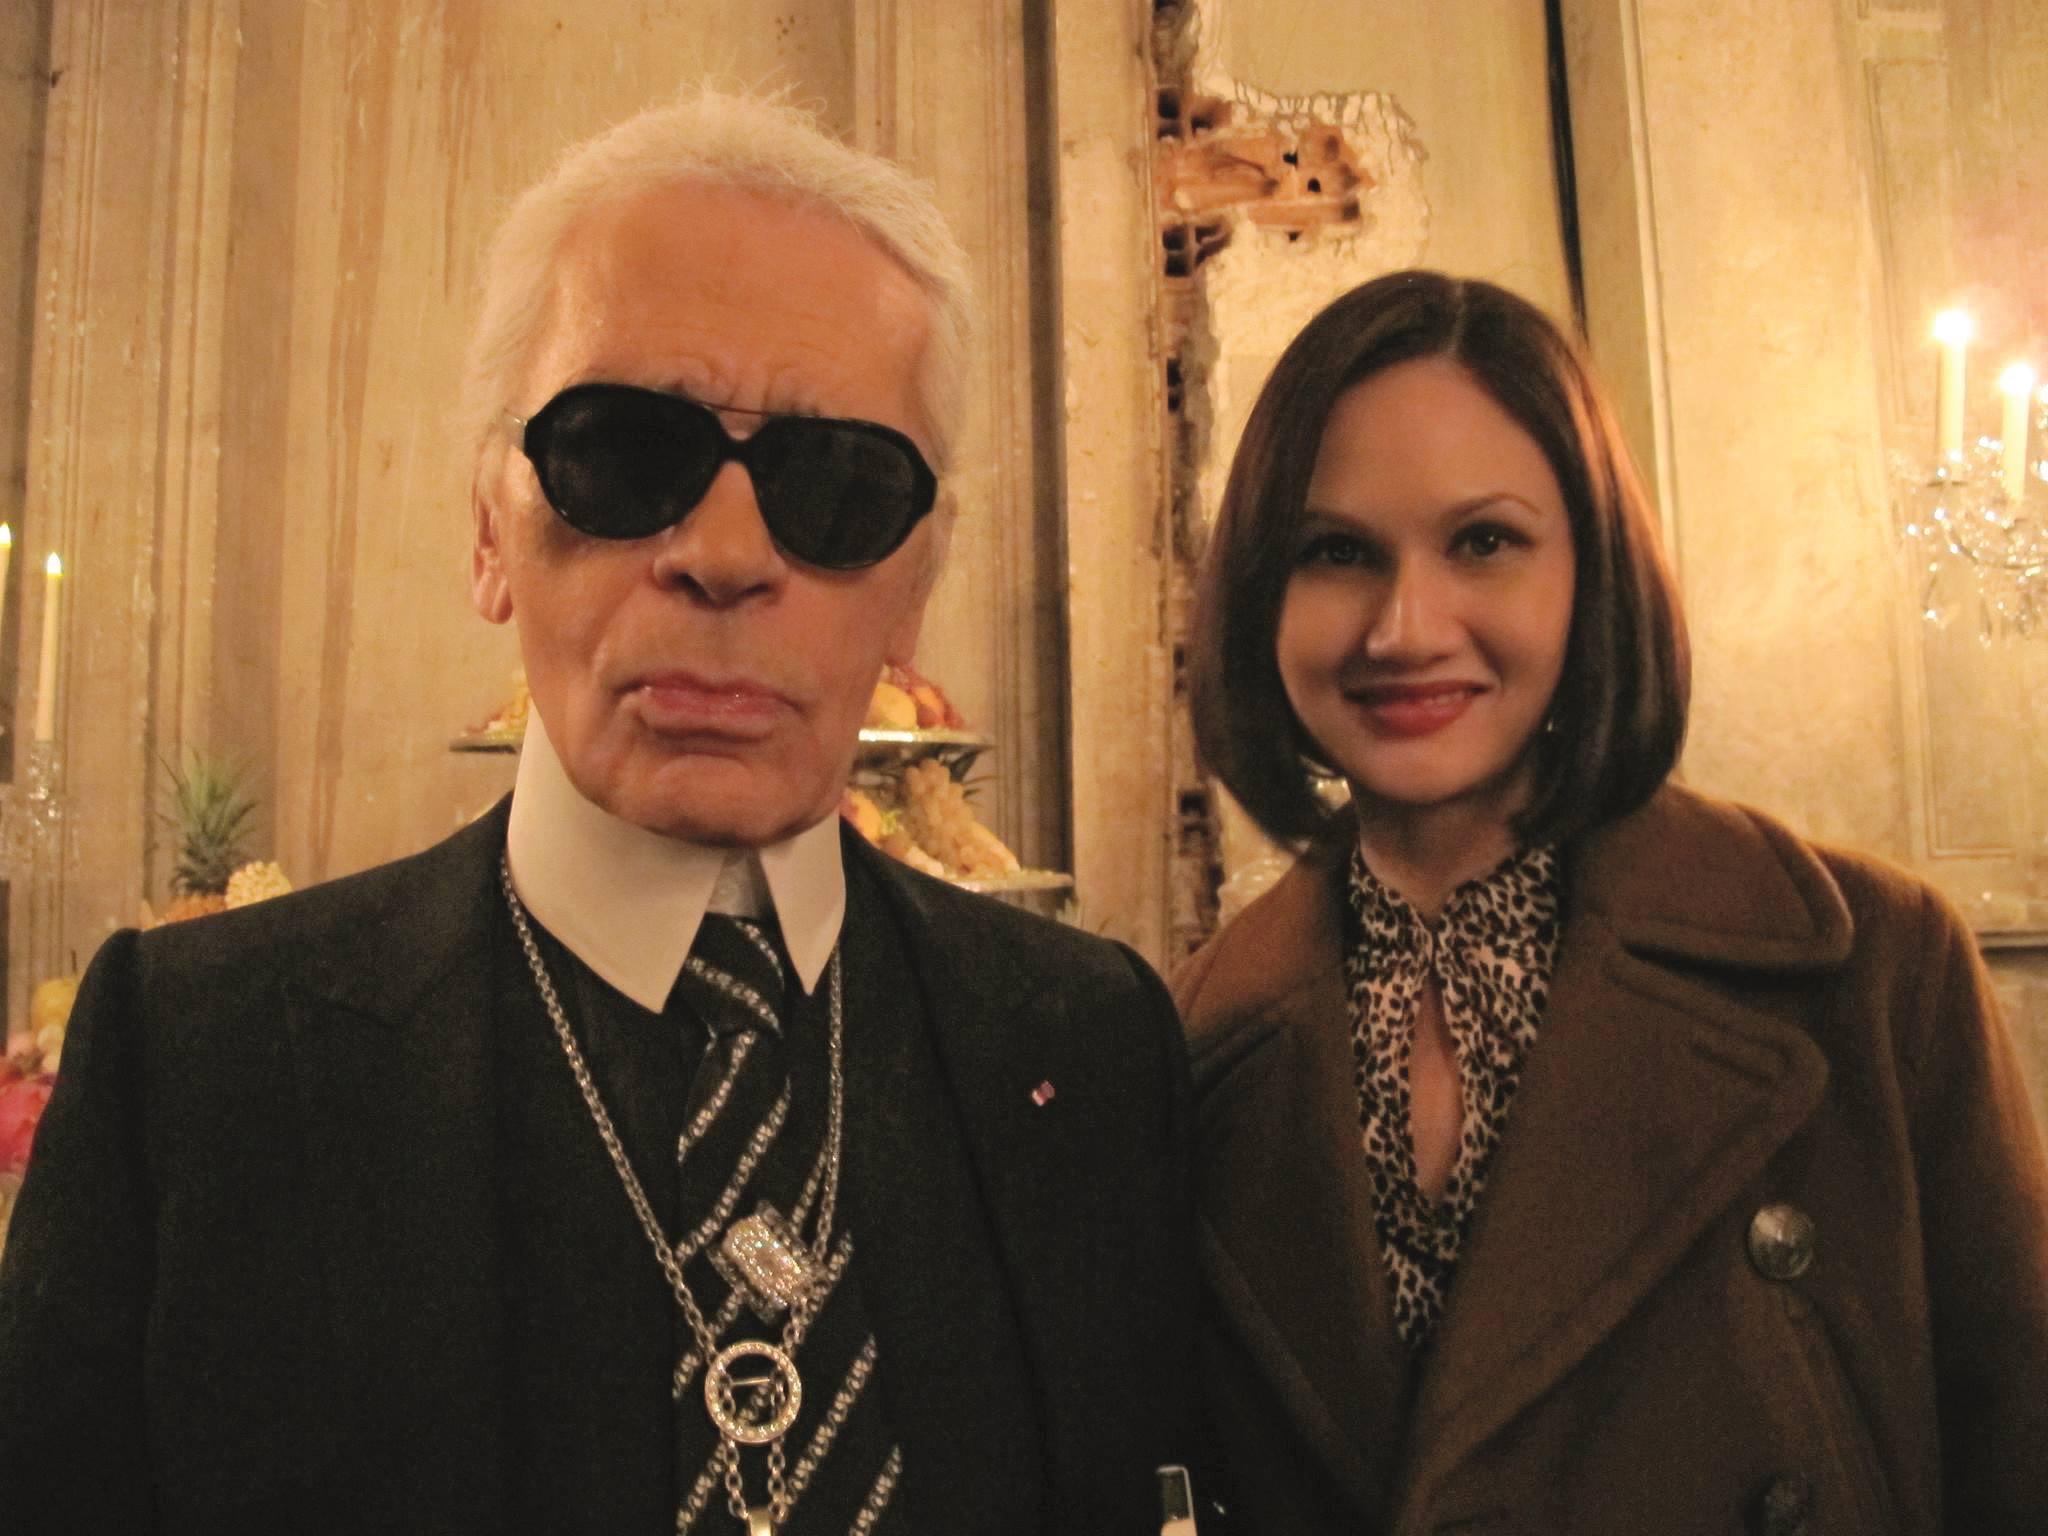 Natasha Kraal Remembers The Prolific Karl Lagerfeld